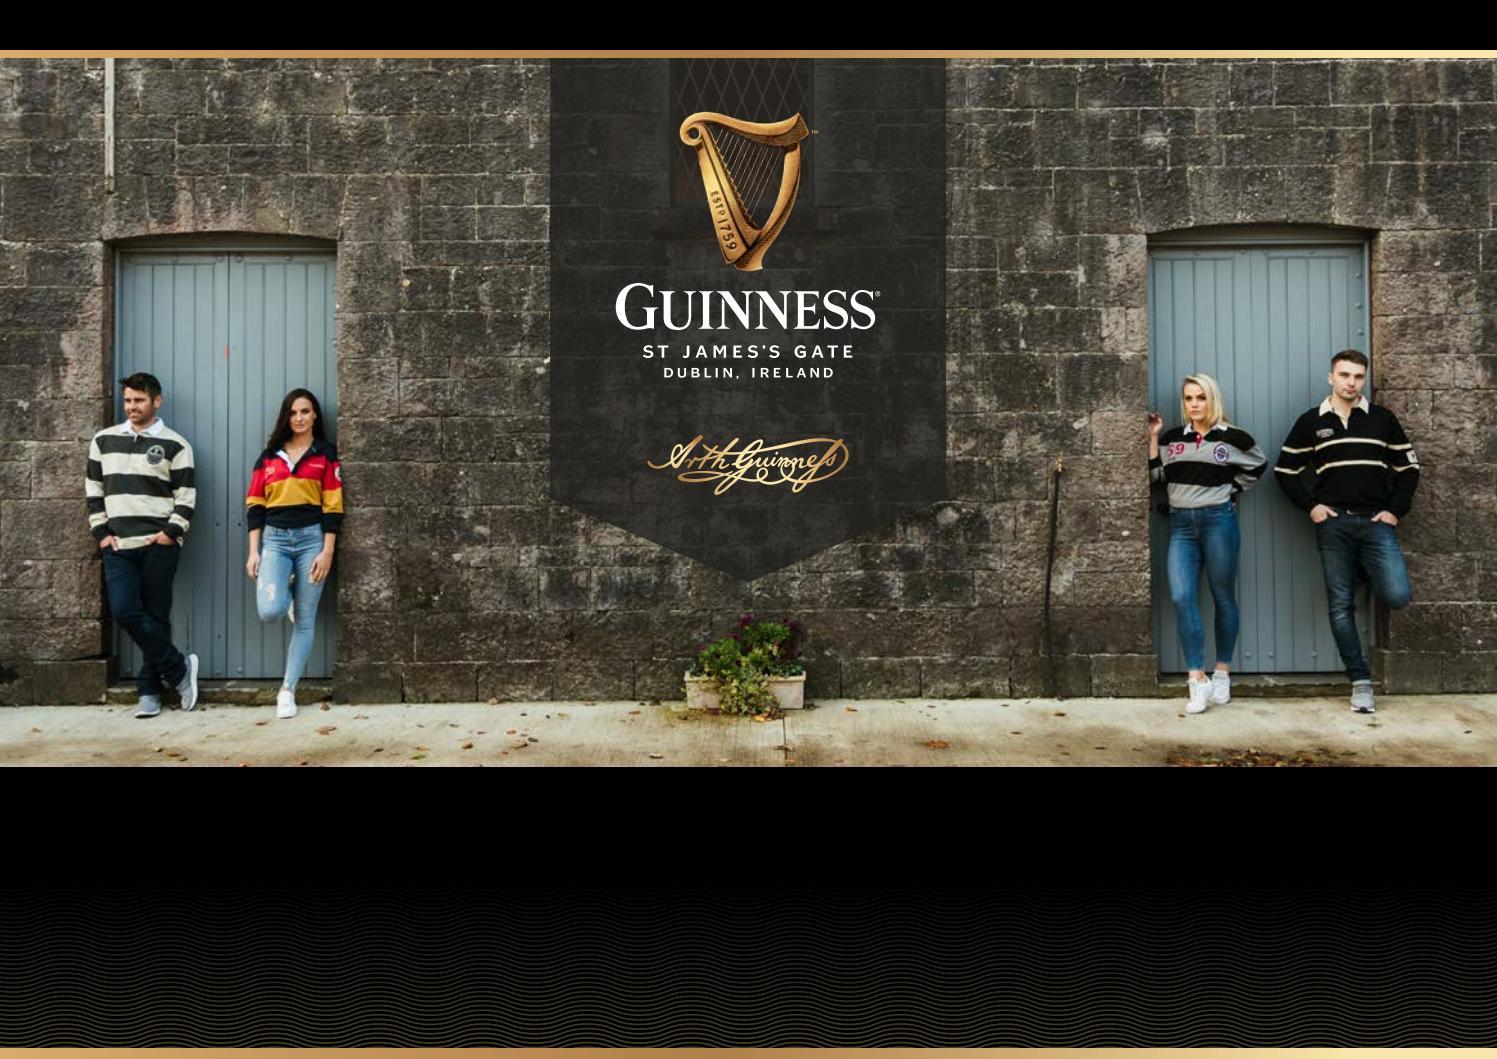 Guinness Beer Irish Ireland Black and Gold Hooded Hockey Shirt Jersey New